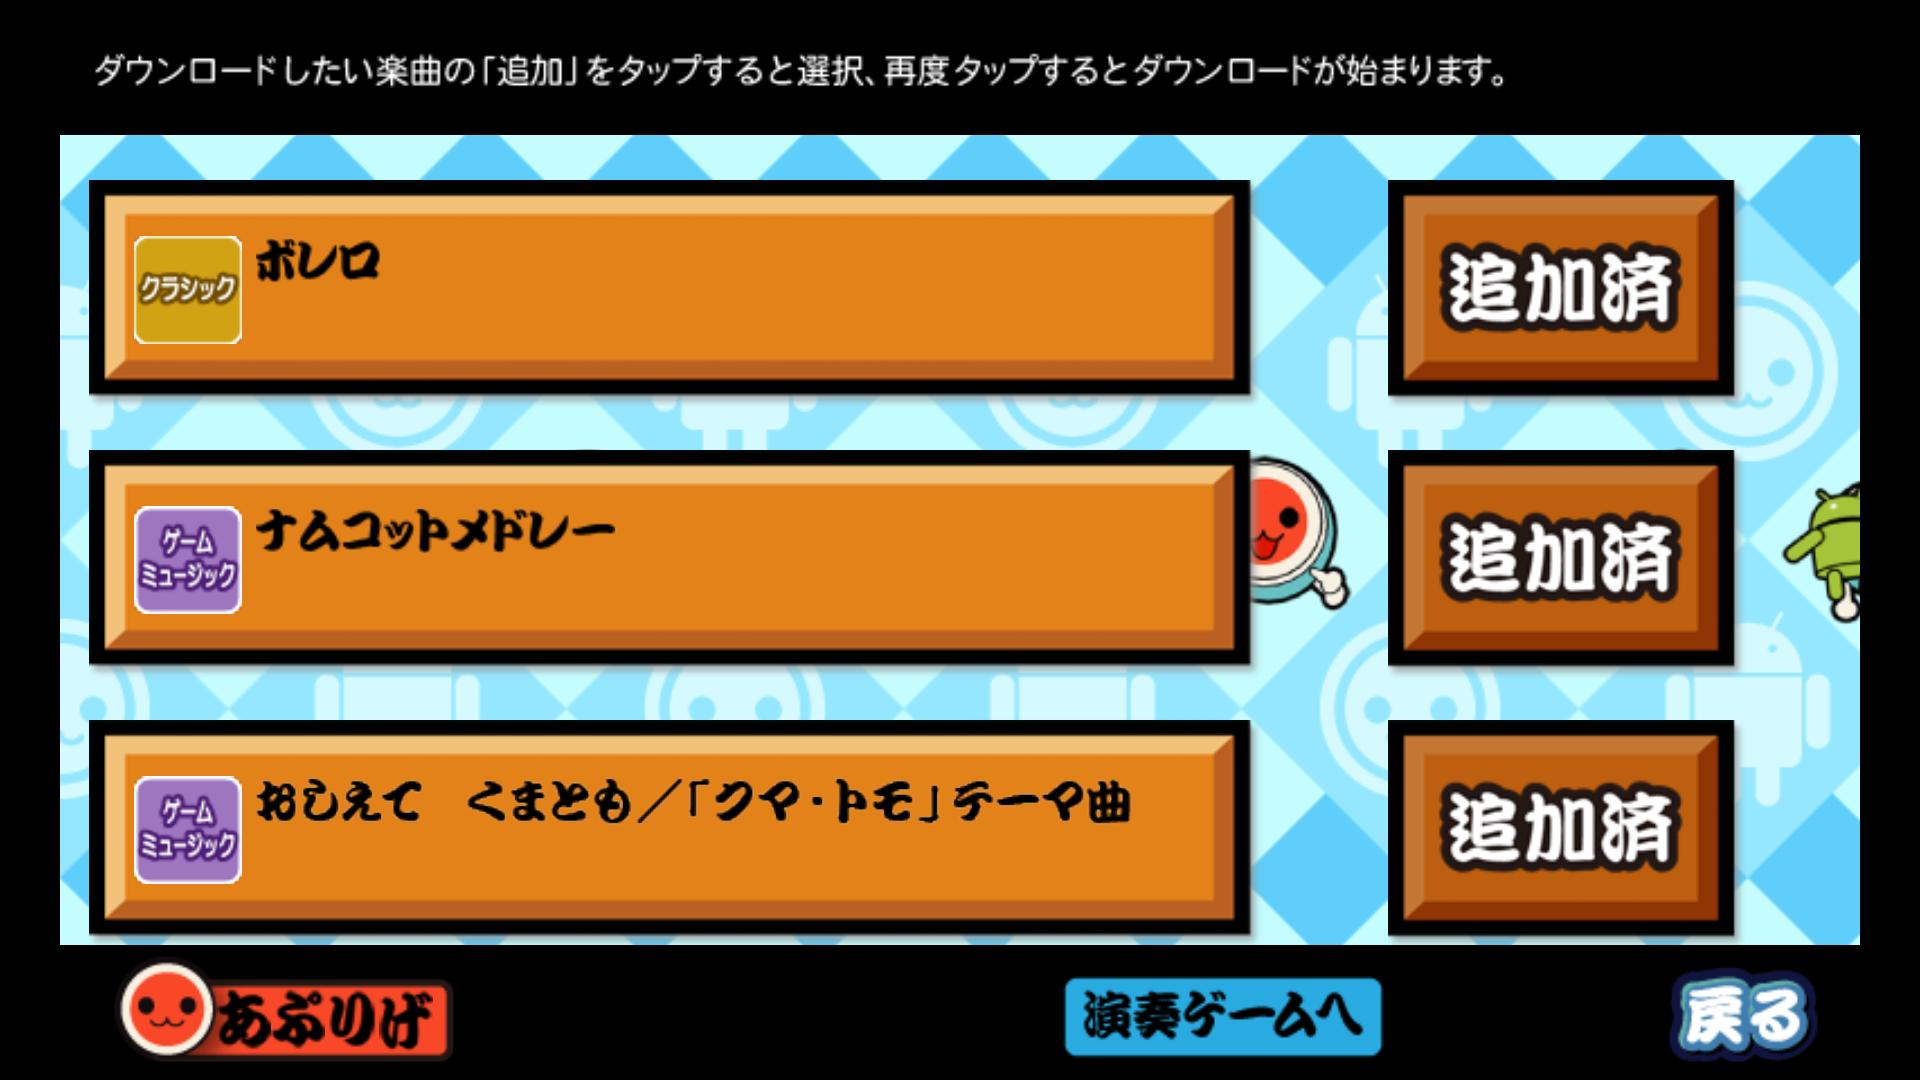 androidアプリ 太鼓の達人プラス攻略スクリーンショット7